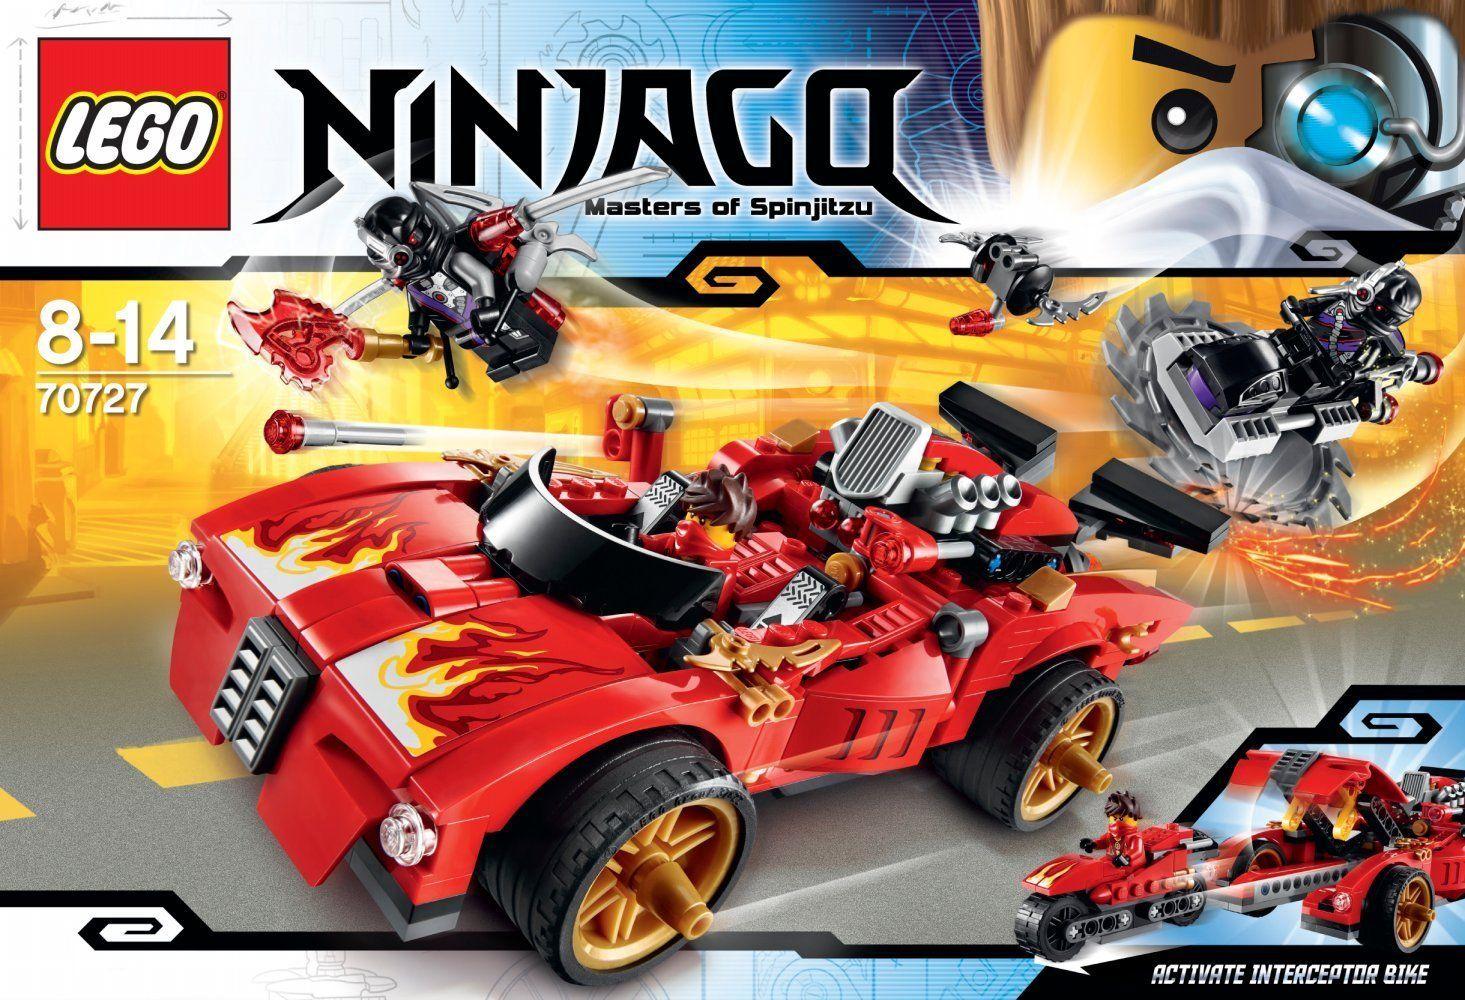 Lego KAI Rebooted Ninja Minifigure NINJAGO 70727 70721